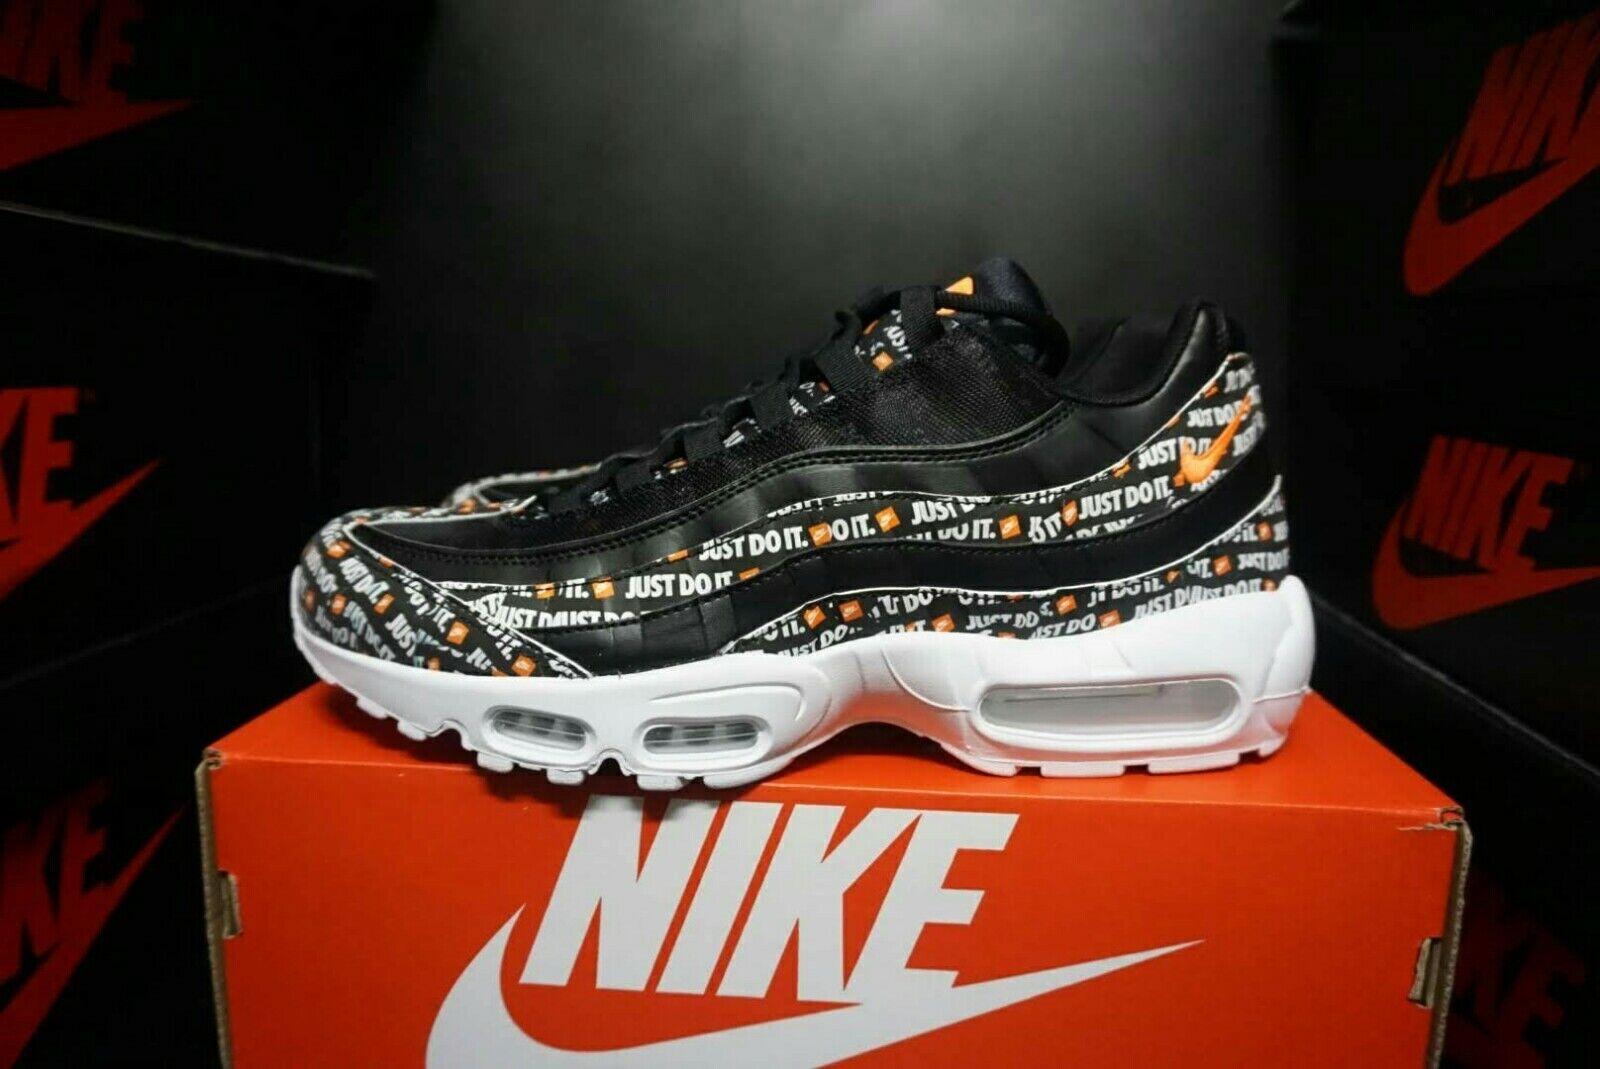 Nike Mens Air Max 95 Black orange Just Do It Pack JDI AV6246-001SZ  M12   W13.5